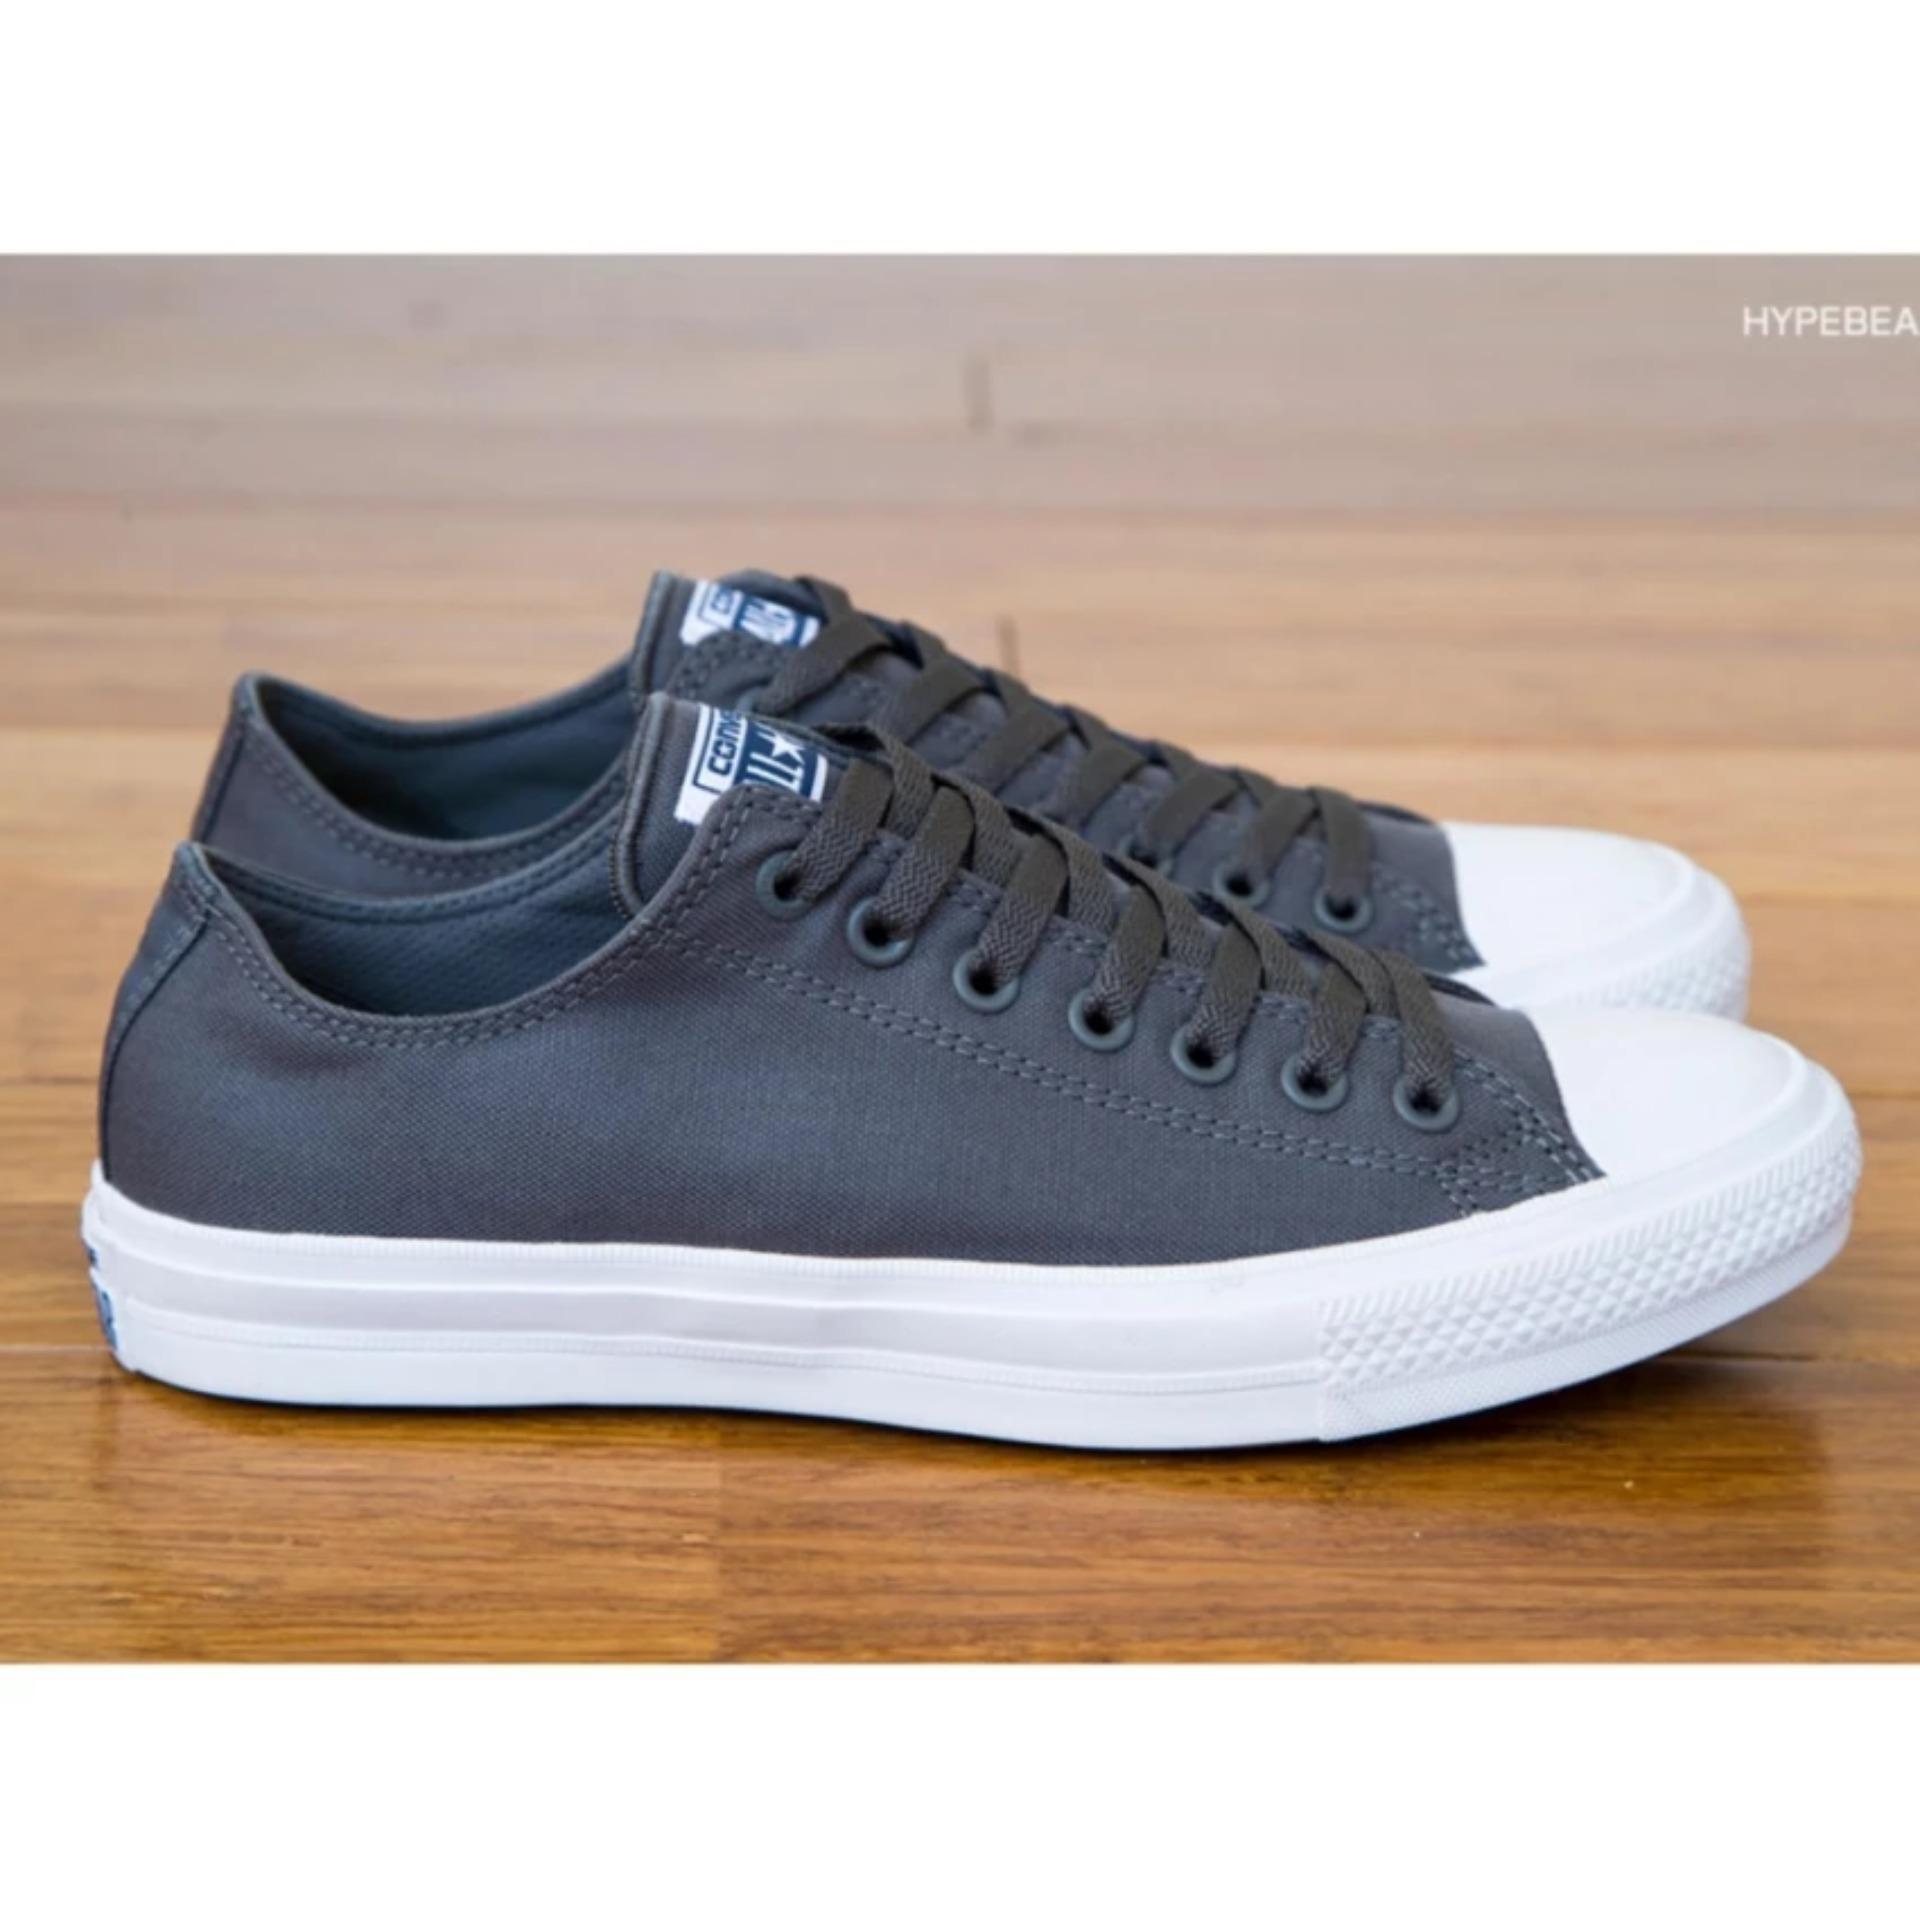 Harga Penawaran Sepatu All Star Sneakers Freestyle Unisex Grey 9e07608b69